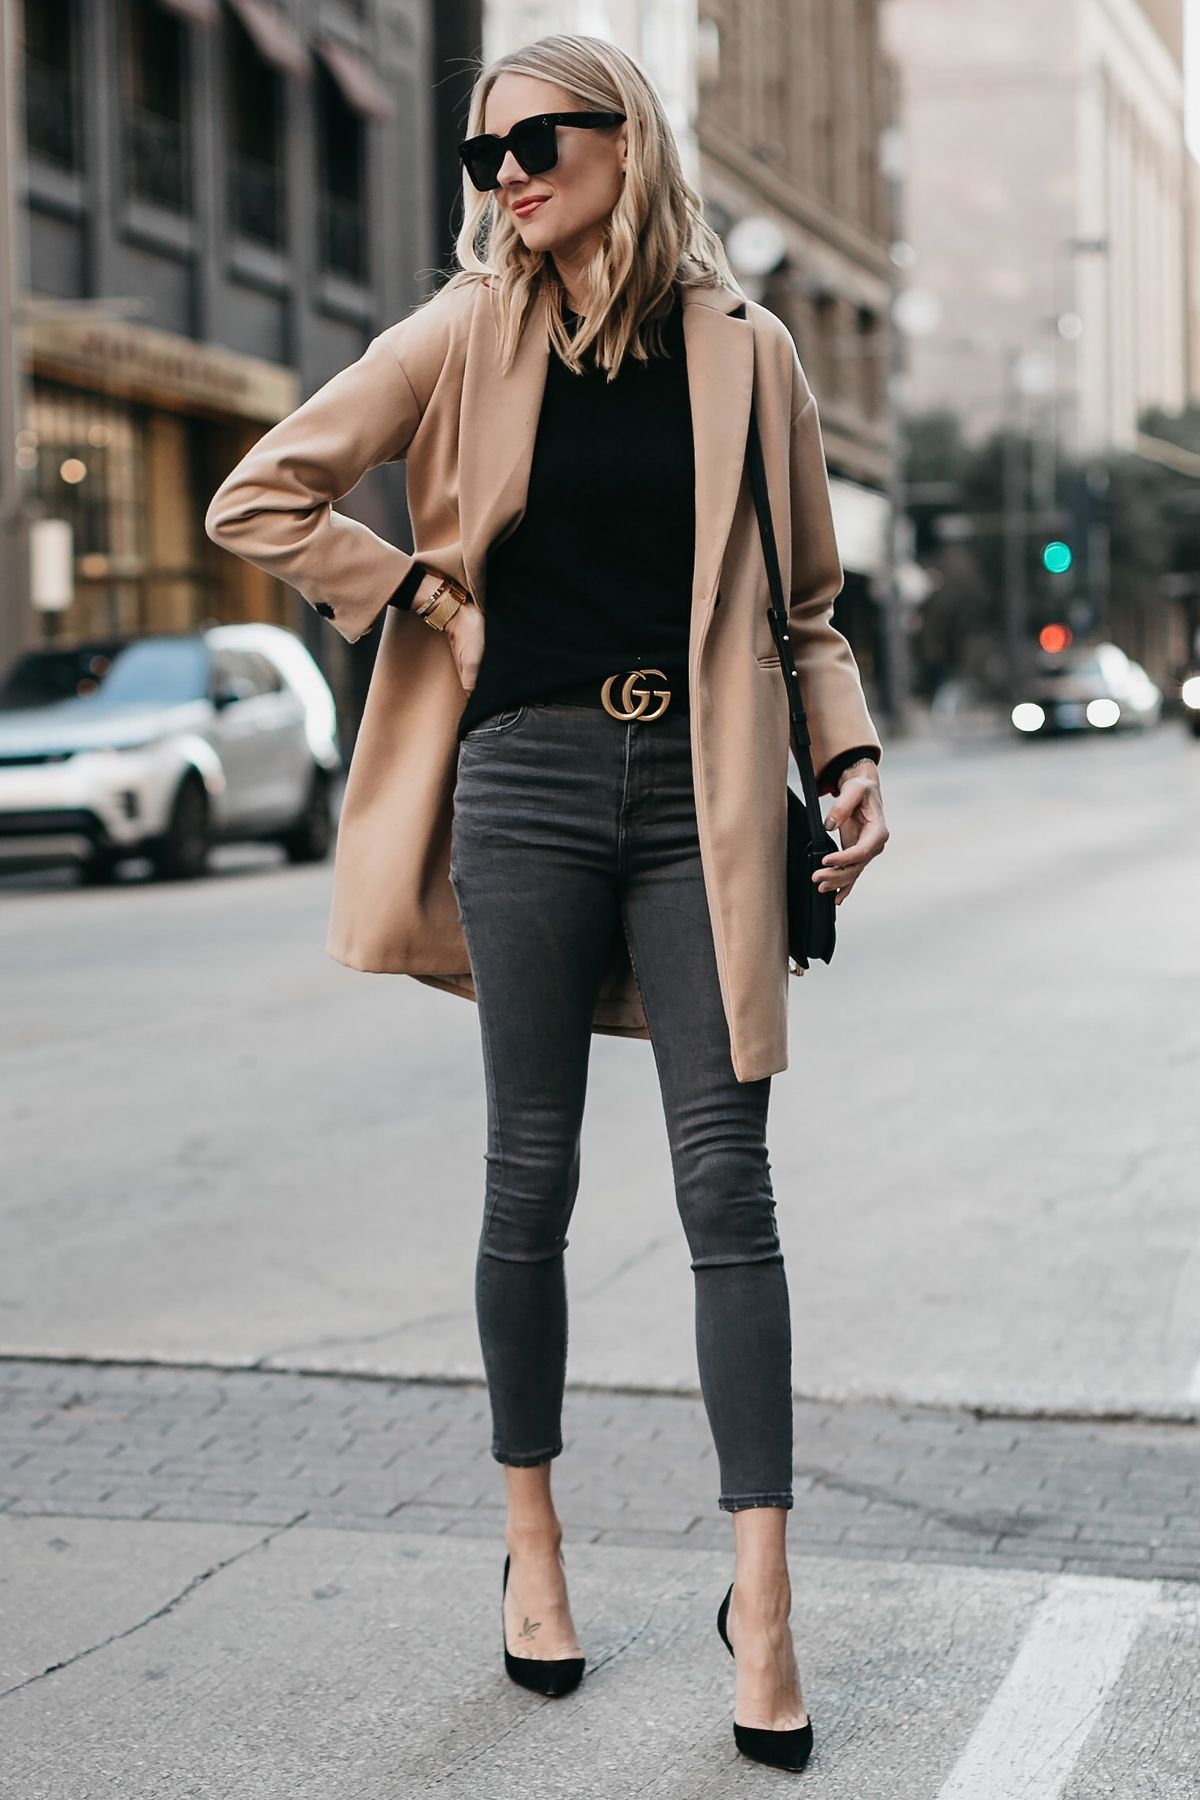 Blonde Woman Wearing Topshop Camel Coat Black Sweater Grey